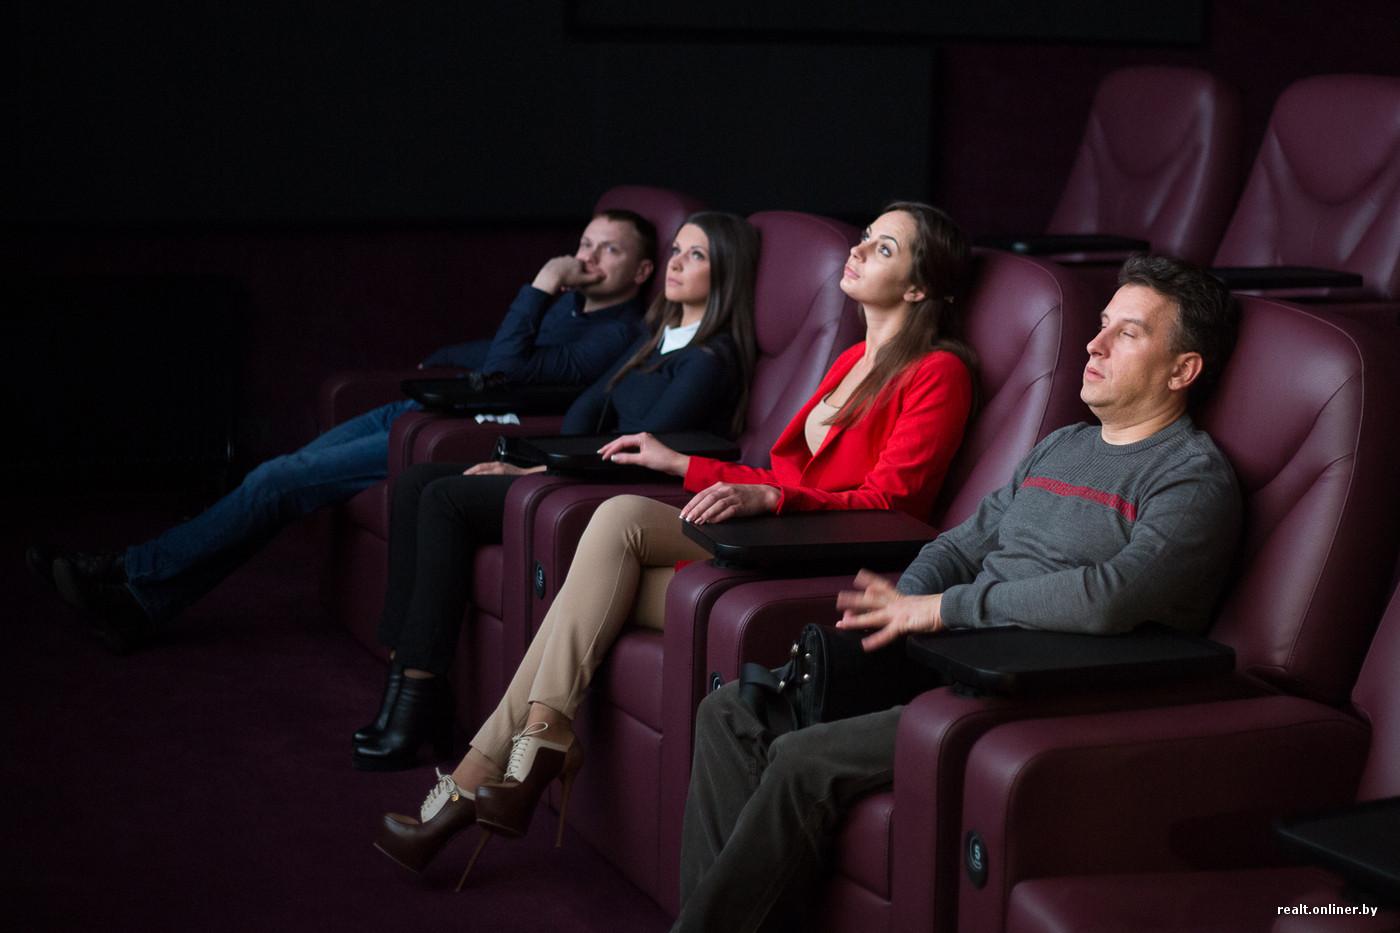 девушку тискают в кинотеатре